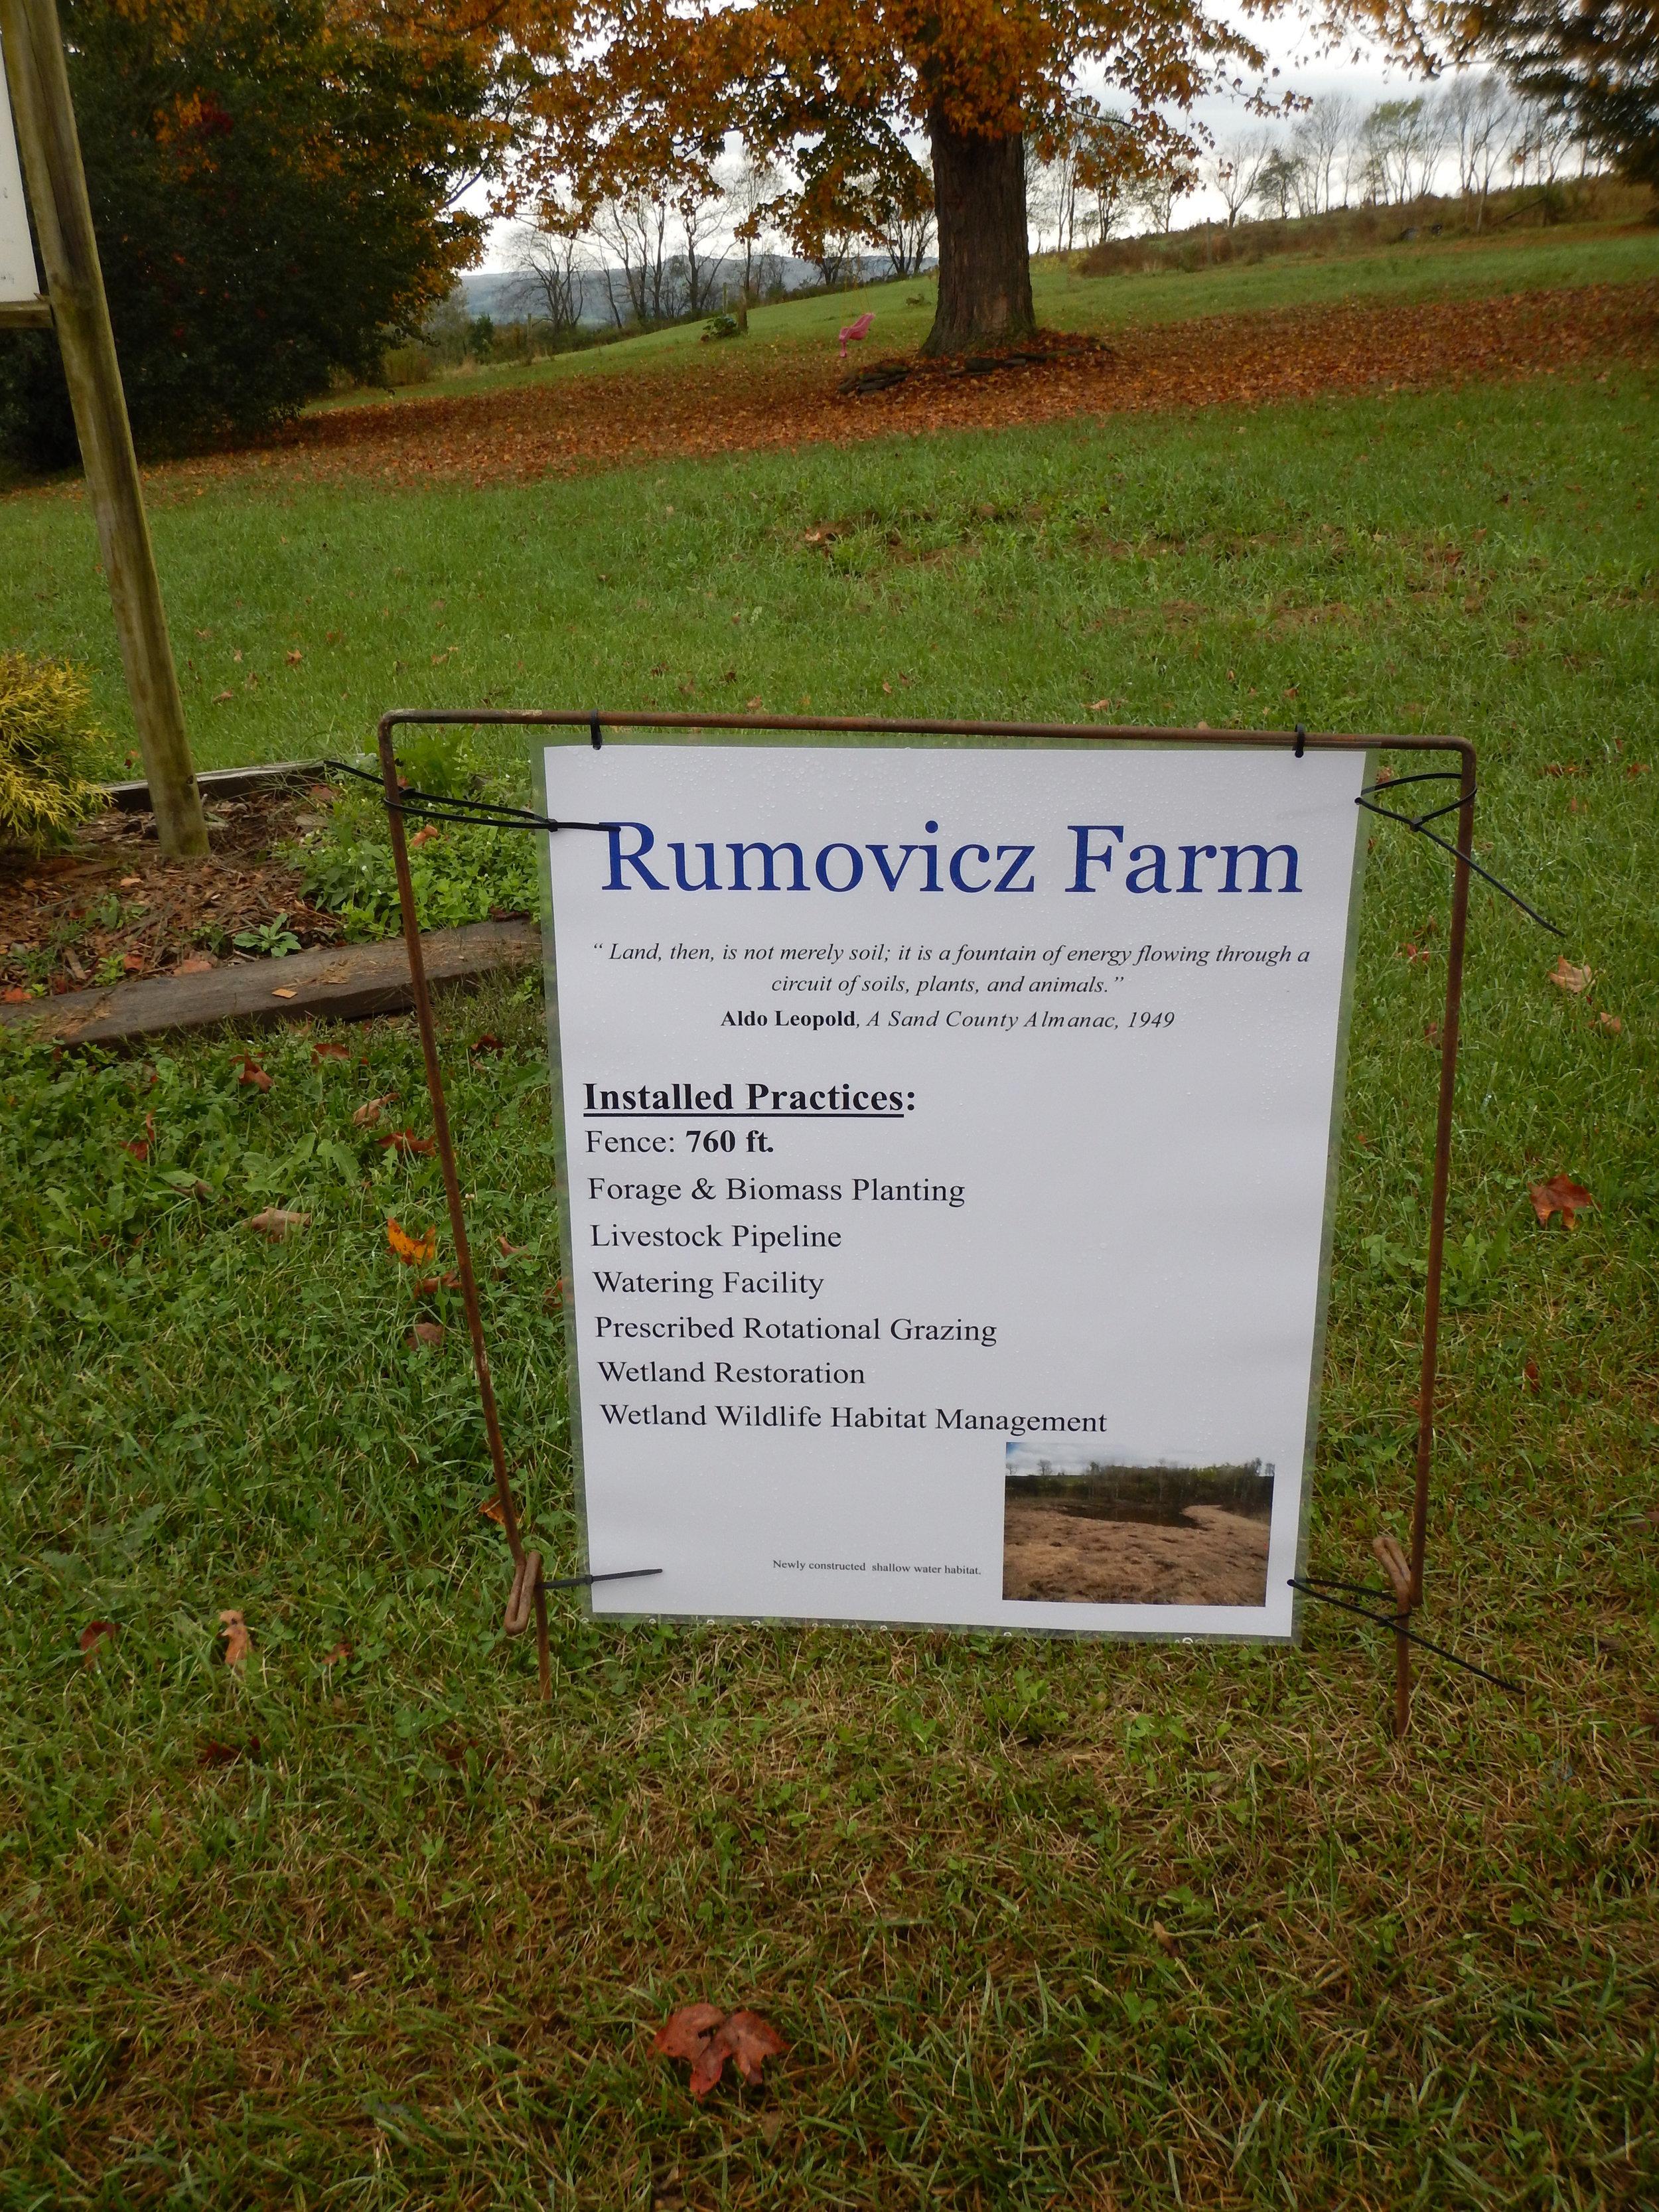 Rumovicz Farm